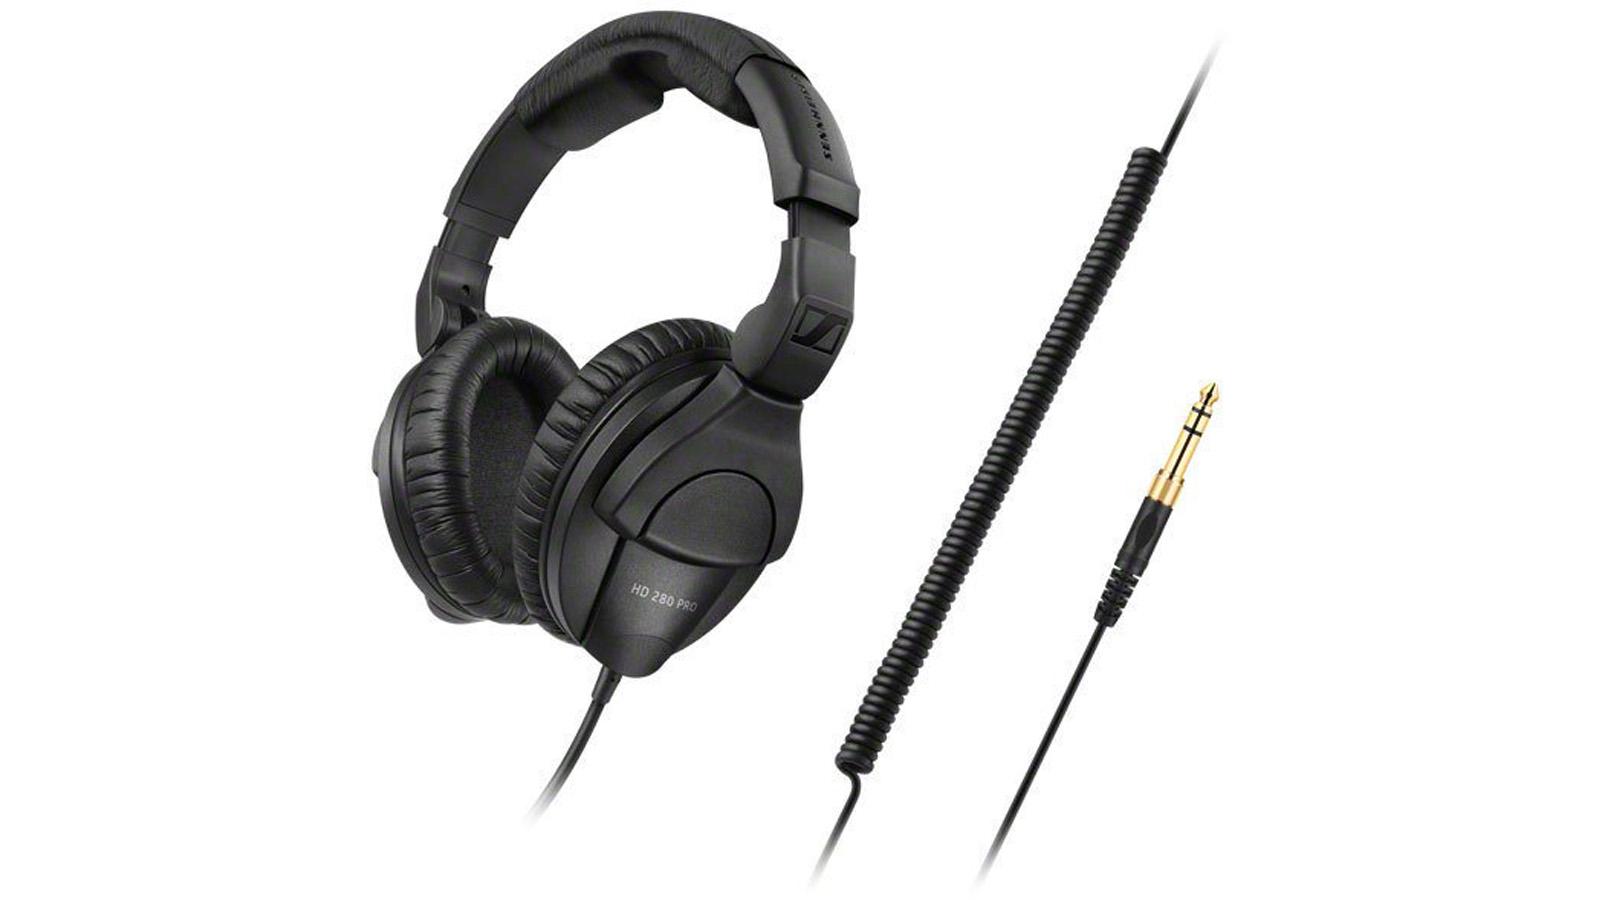 Sennheiser HD-280 Pro Kopfhörer